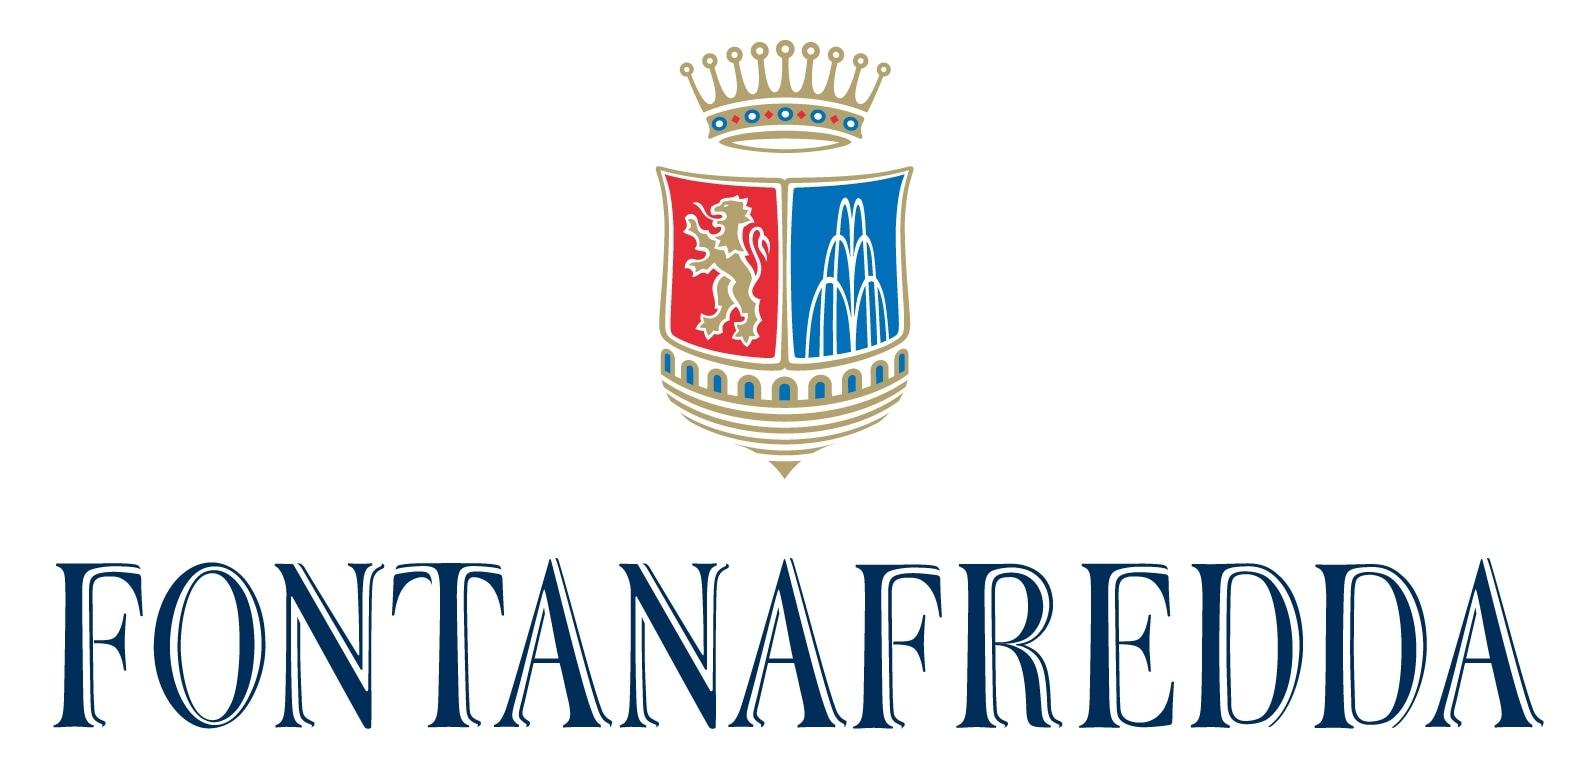 FONTANAFREDDA/フォンタナフレッダ